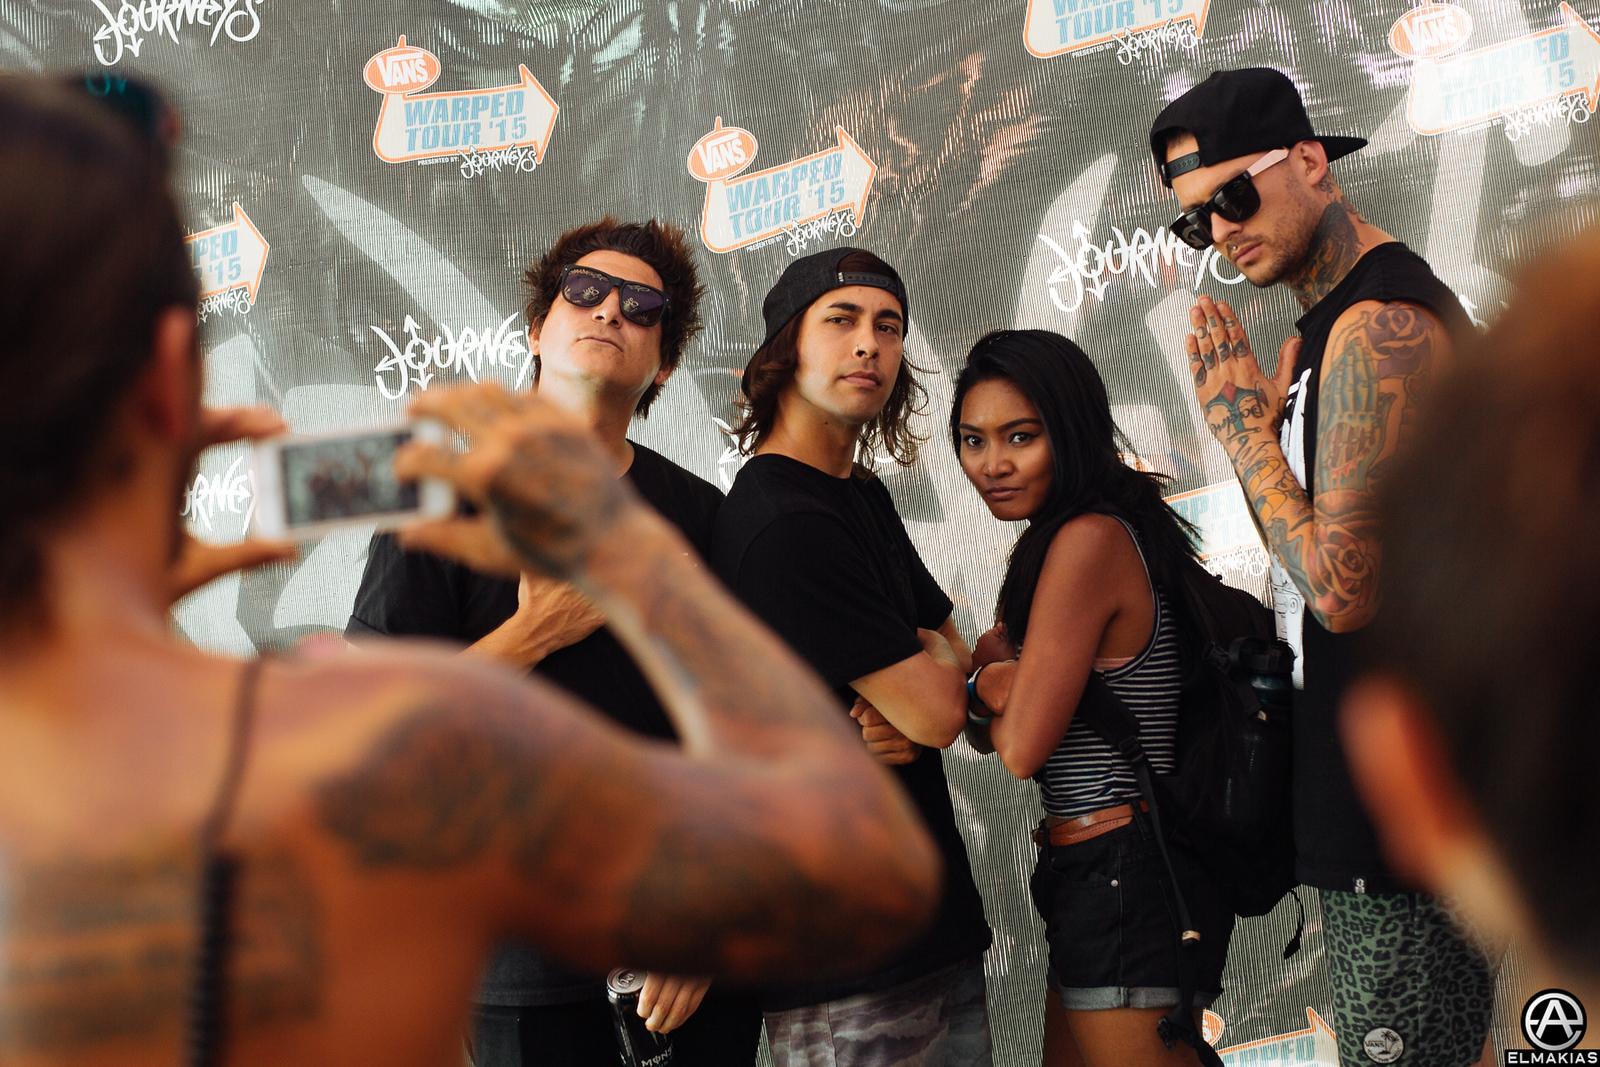 Pierce the Veil and fan at Warped Tour 2015 by Adam Elmakias